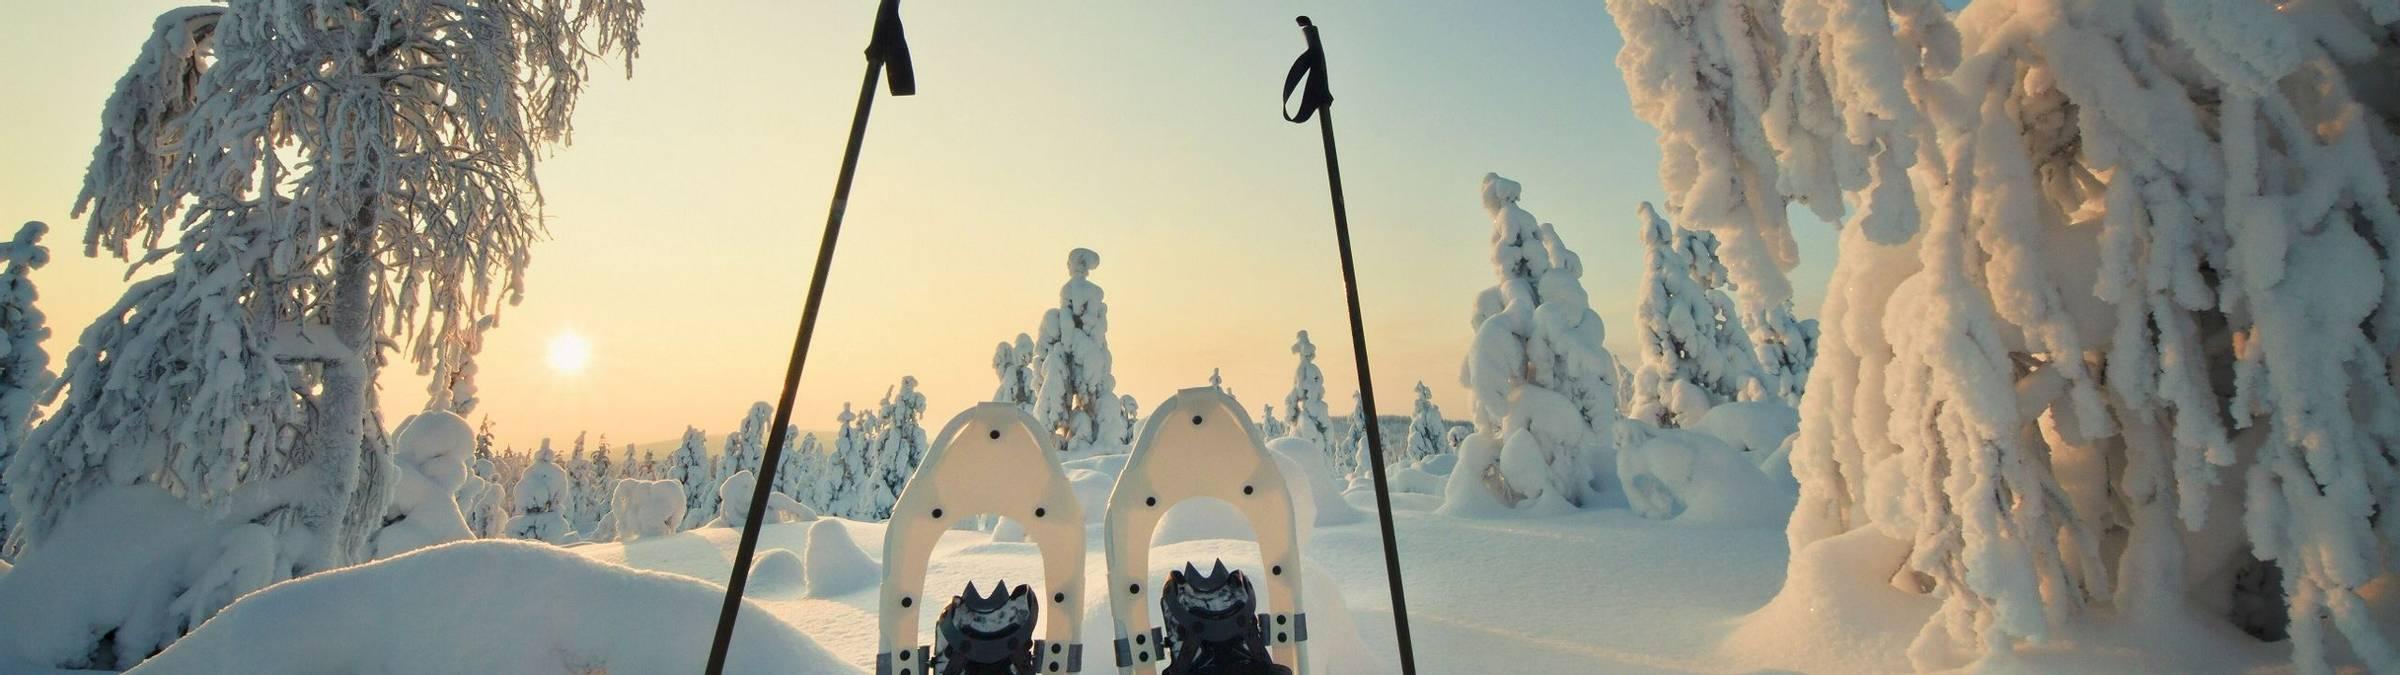 -vastavalo- petri jauhiainen and visit finland.jpg